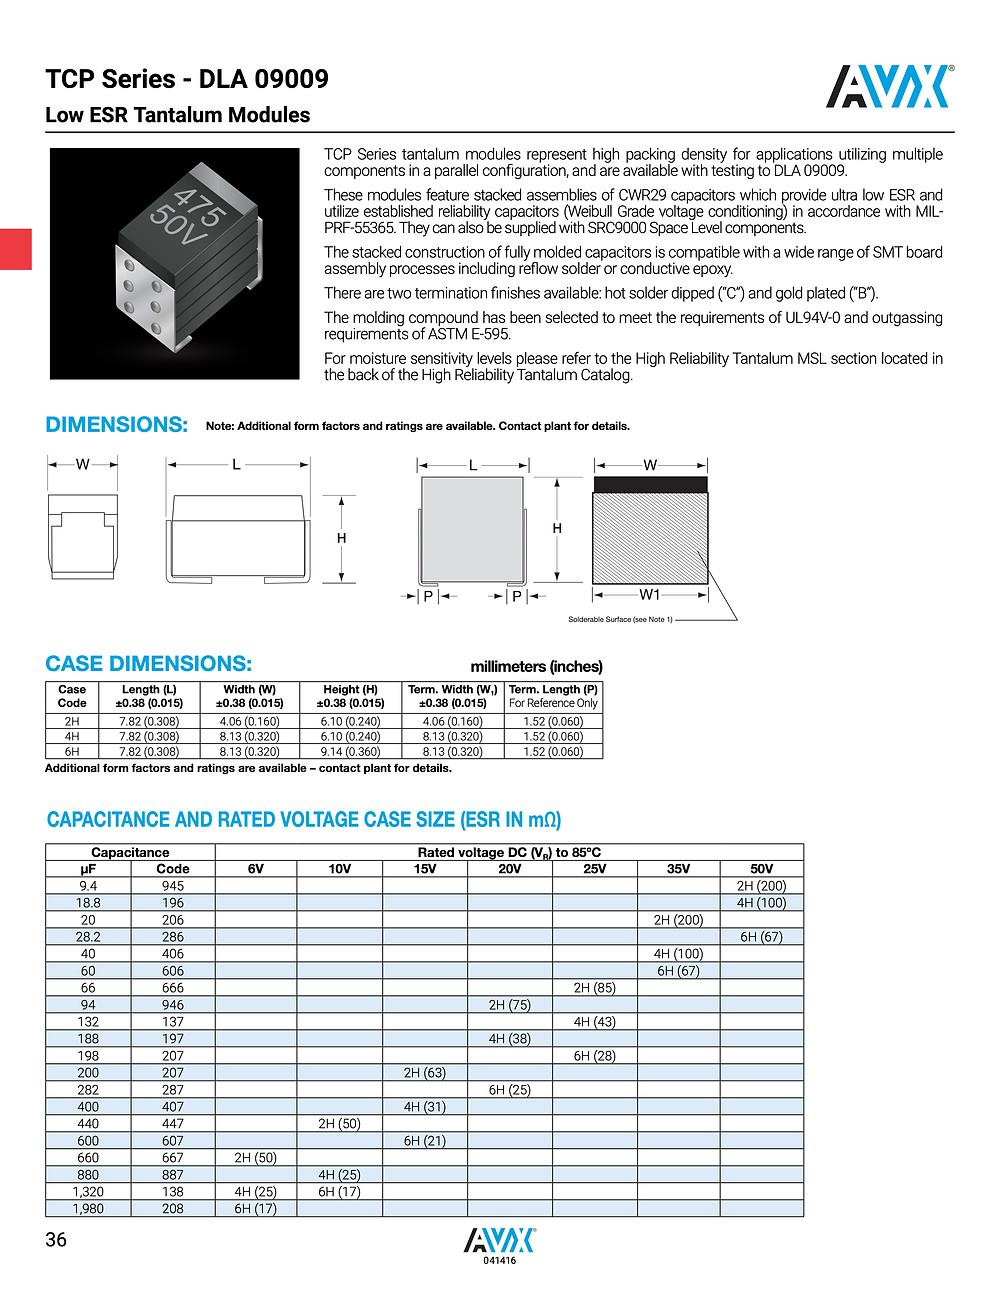 AVX TCP Series Capacitor